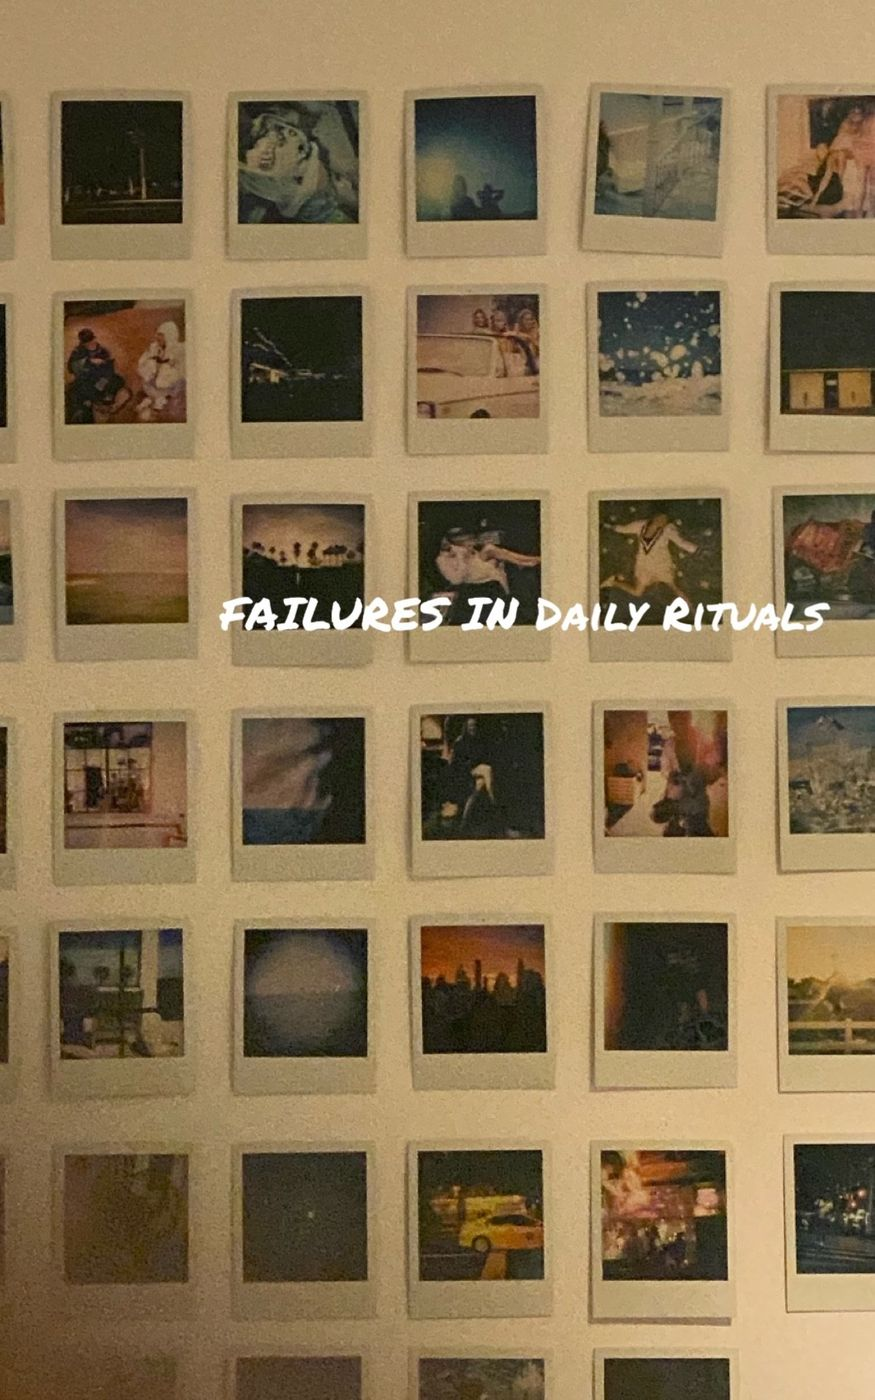 Failure in Daily Rituals